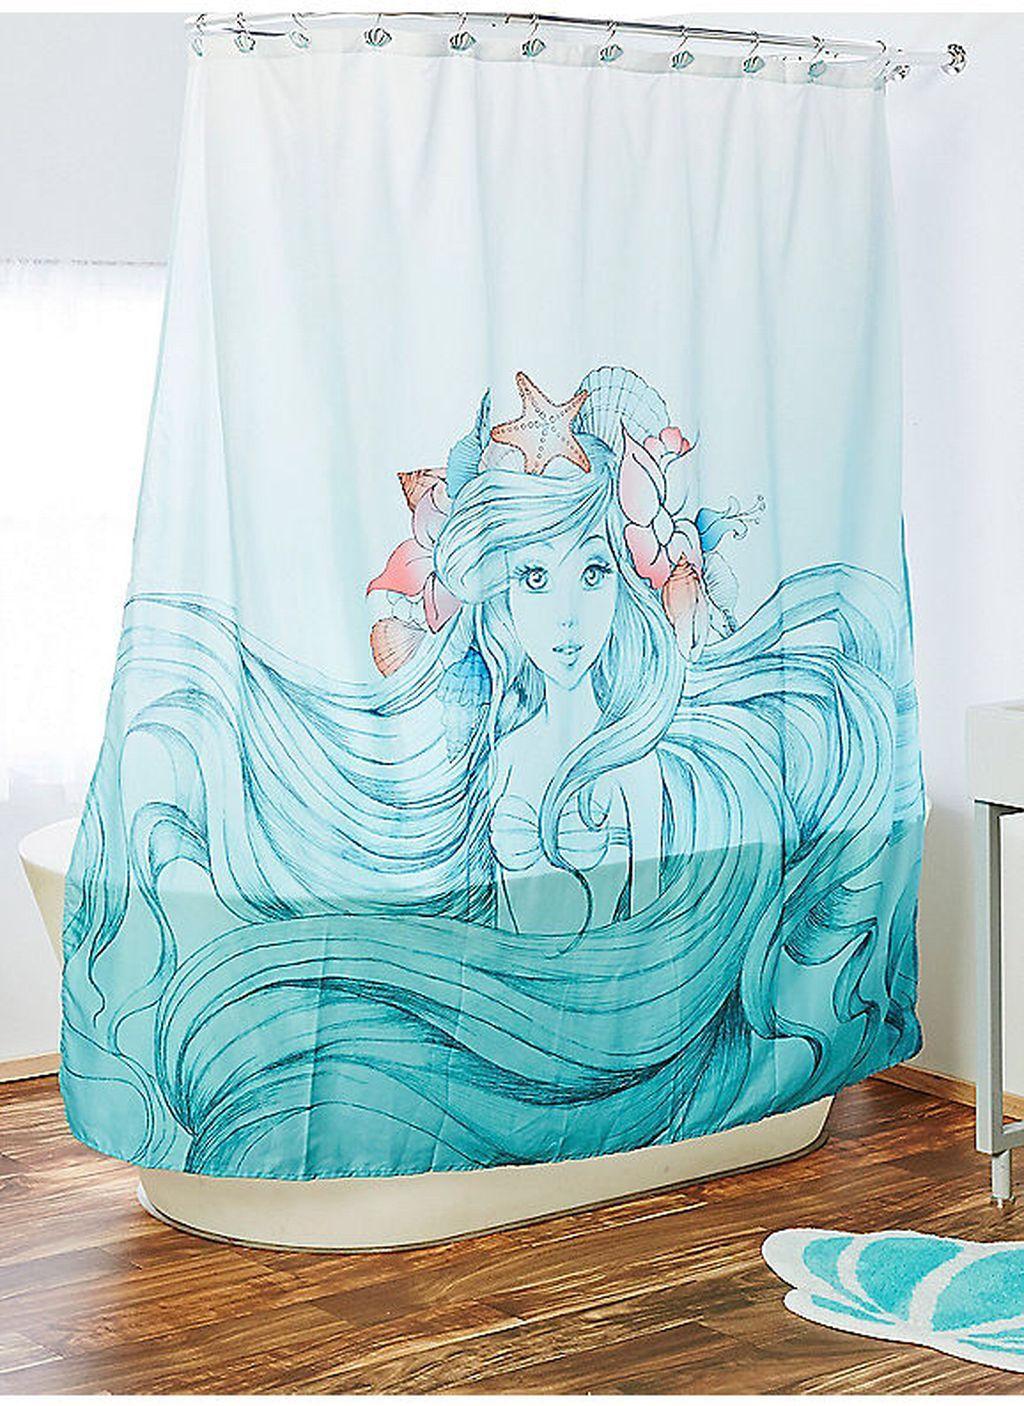 30 Mermaid Shower Curtain For Kids Bathroom